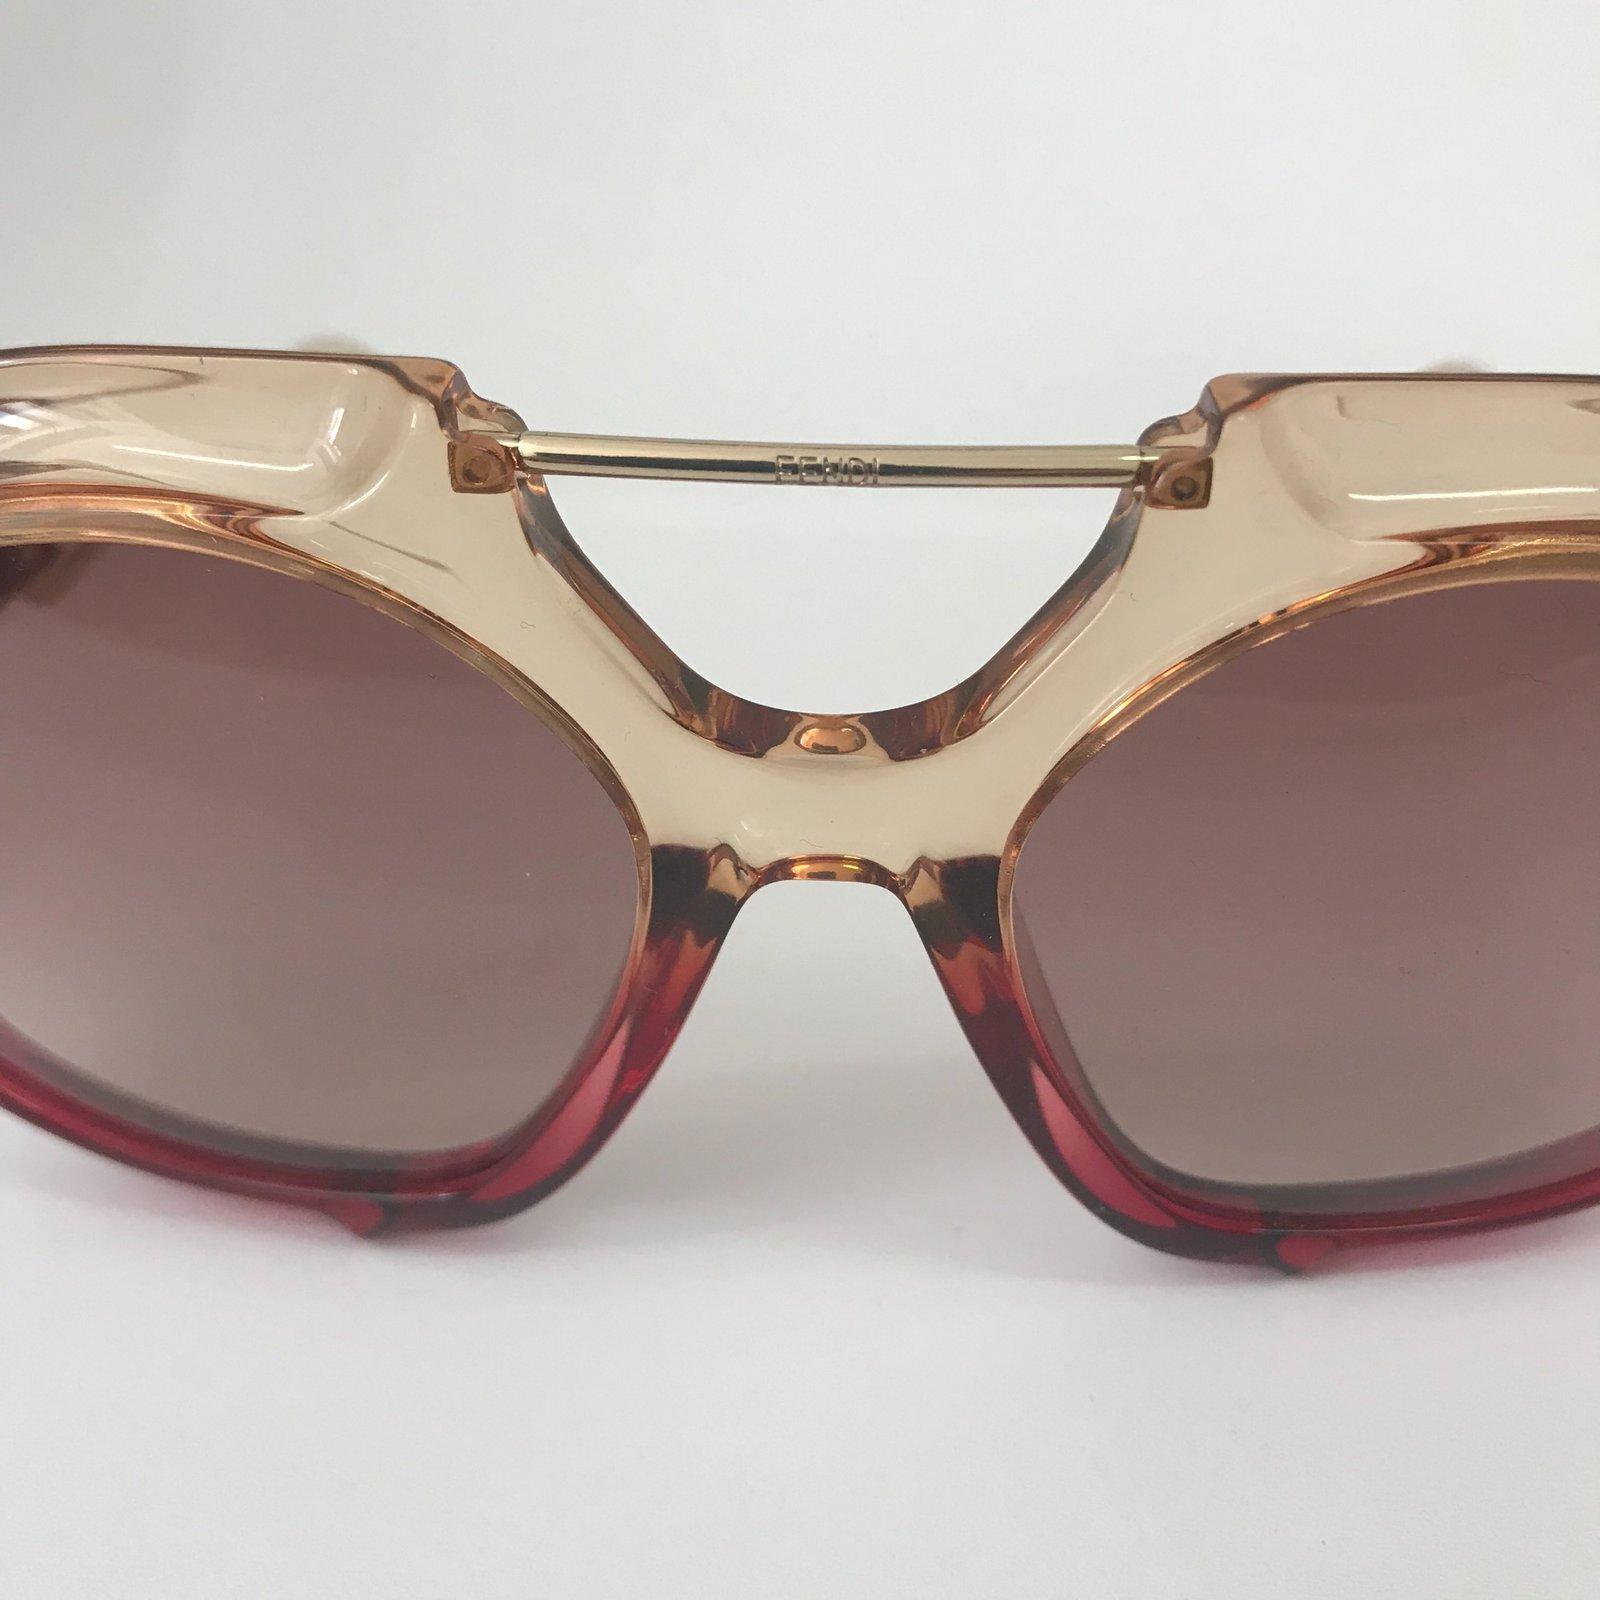 64da75e712c60 Fendi FENDI SUNGLASSS LUNETTES TROPICAL SHINE Pink and red Sunglasses Other  Red ref.72921 - Joli Closet